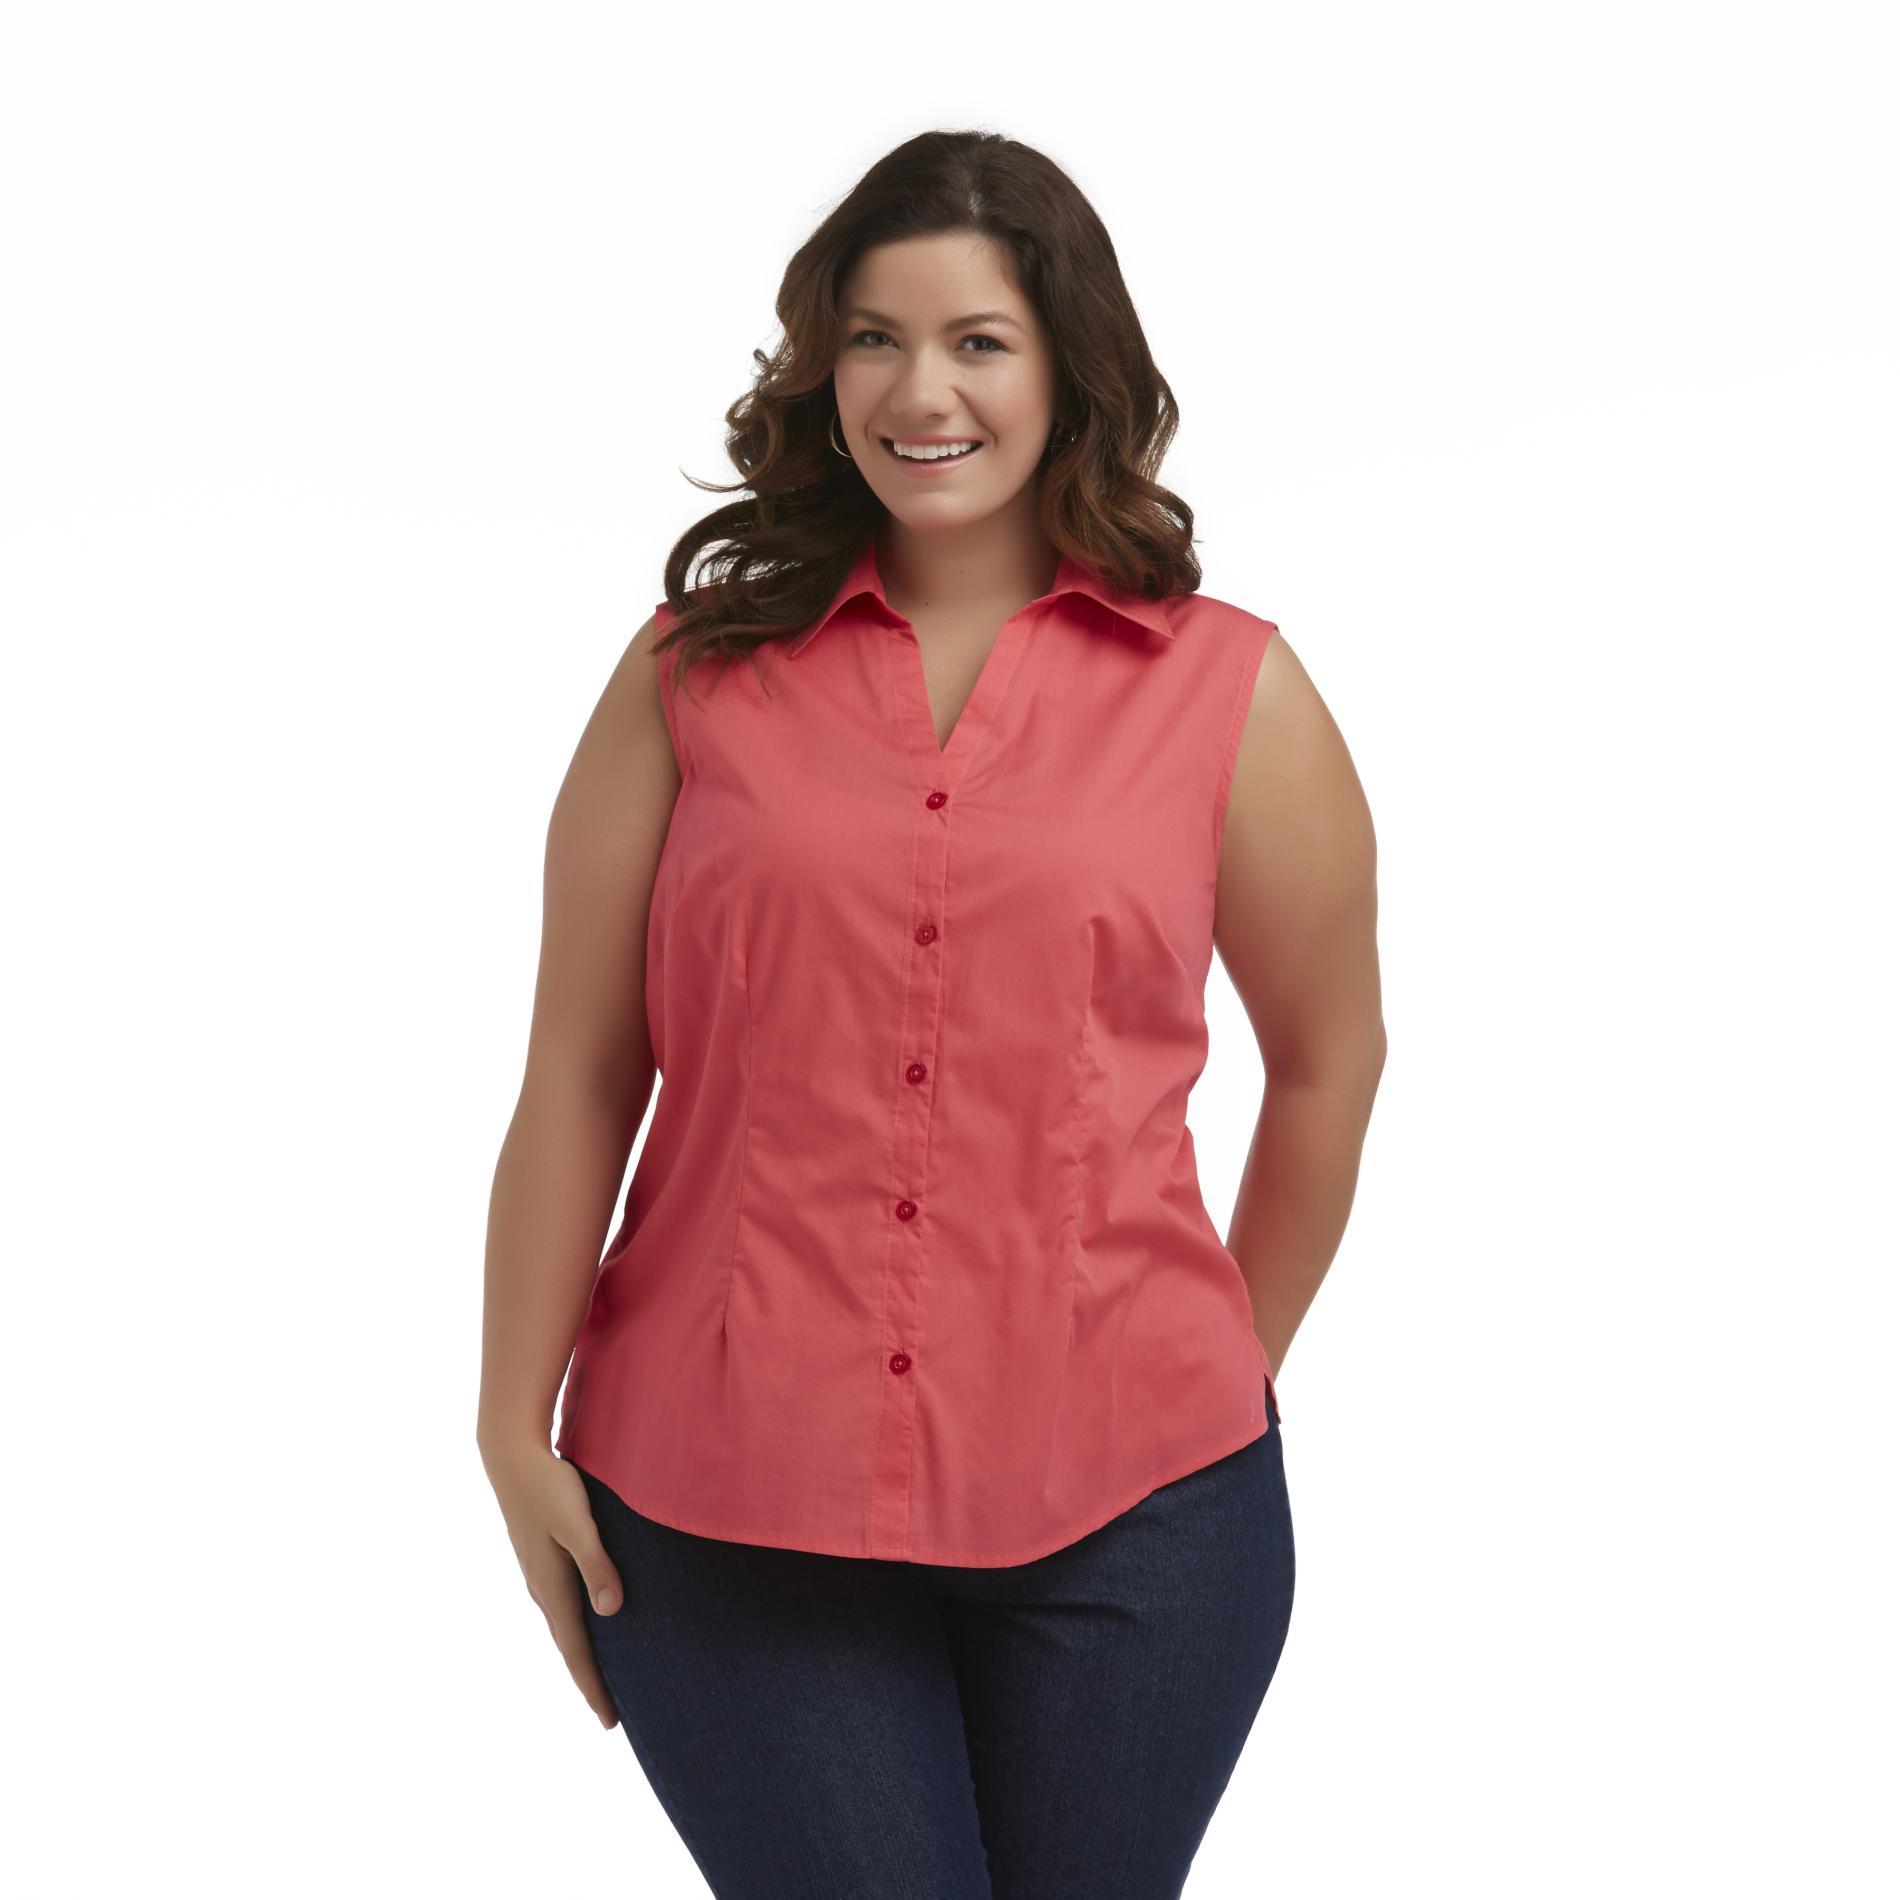 Basic Editions Women's Plus Sleeveless Camp Shirt at Kmart.com